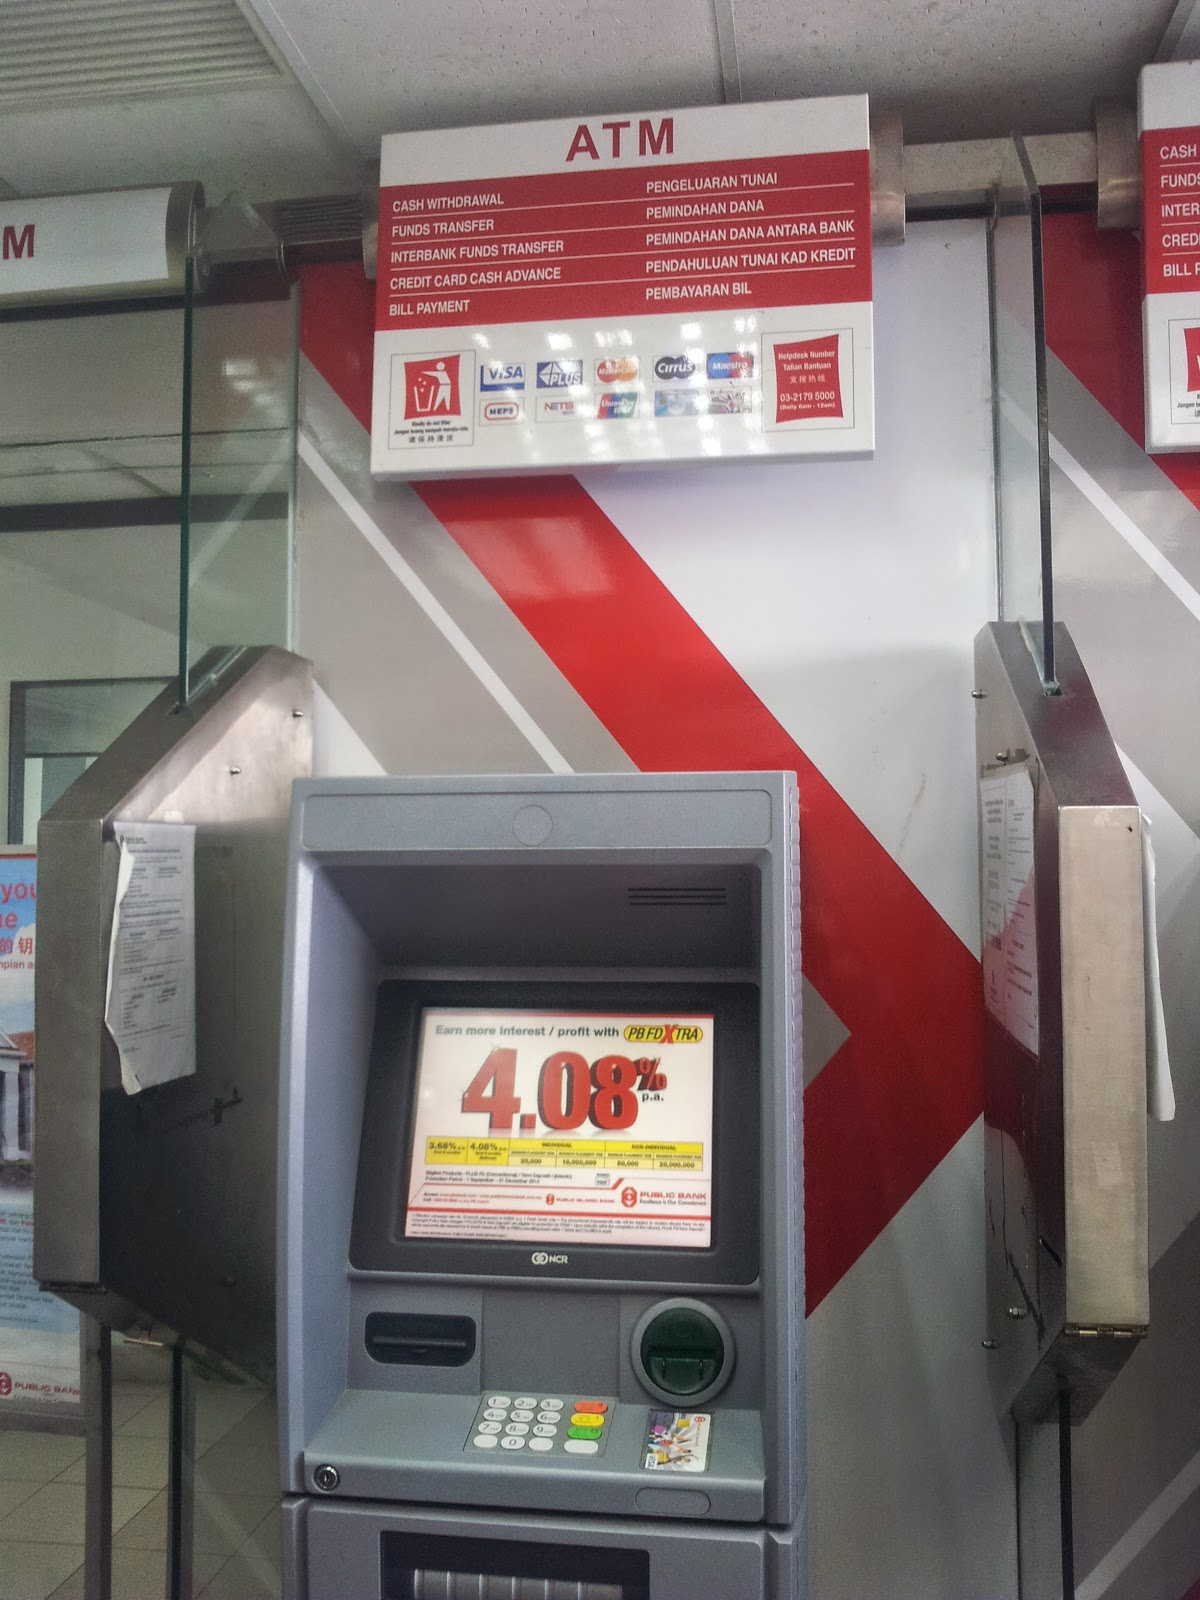 ATM Machine in Sarawak: 20  PUBLIC BANK